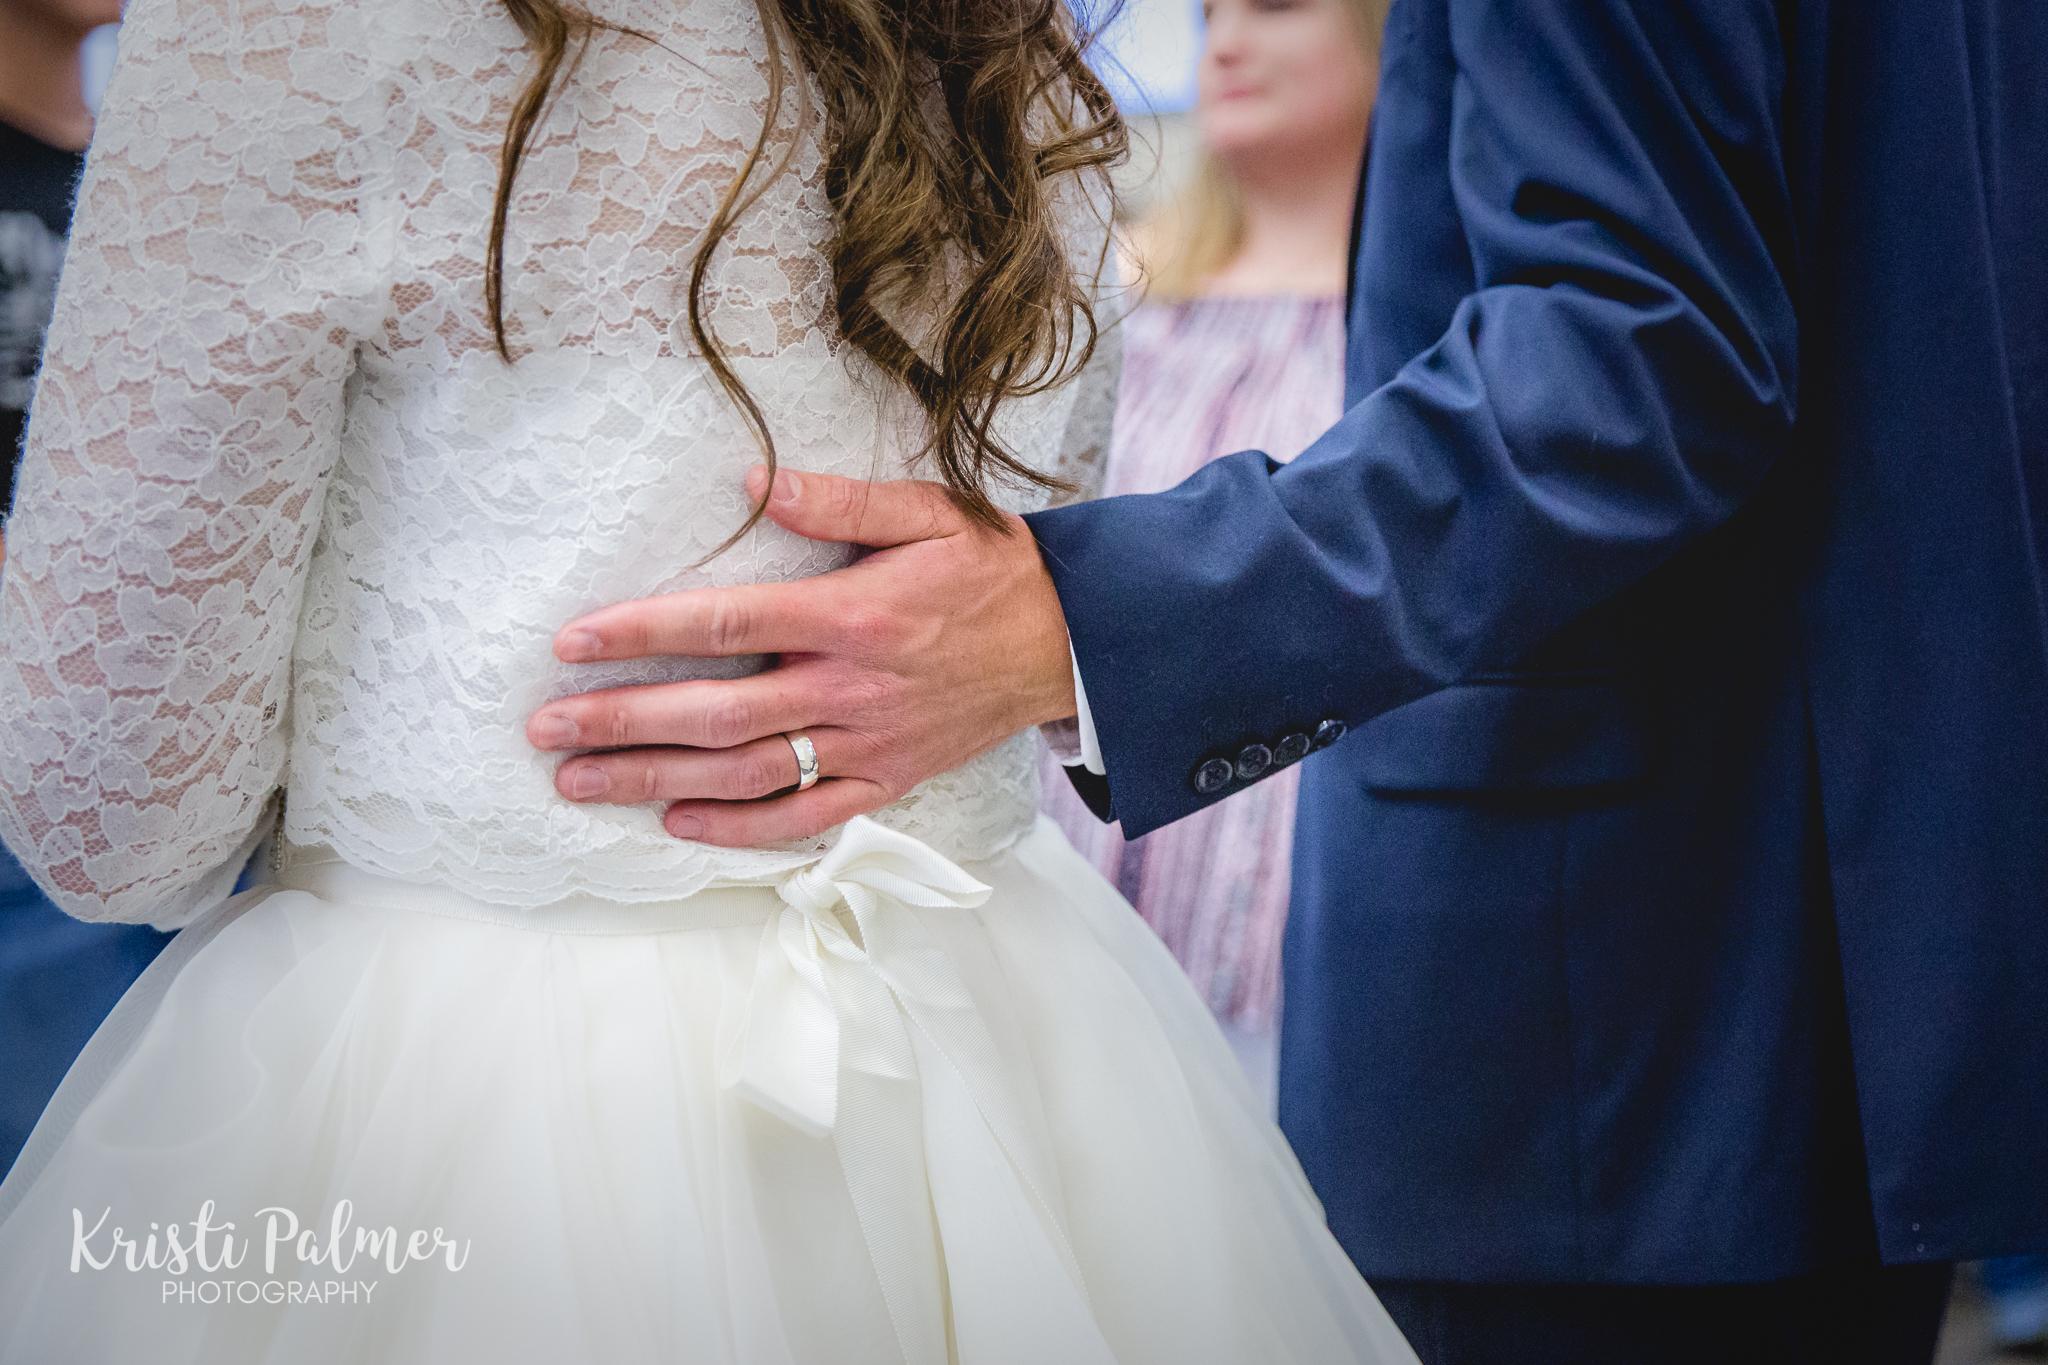 wedding ring bride and groom detail shot